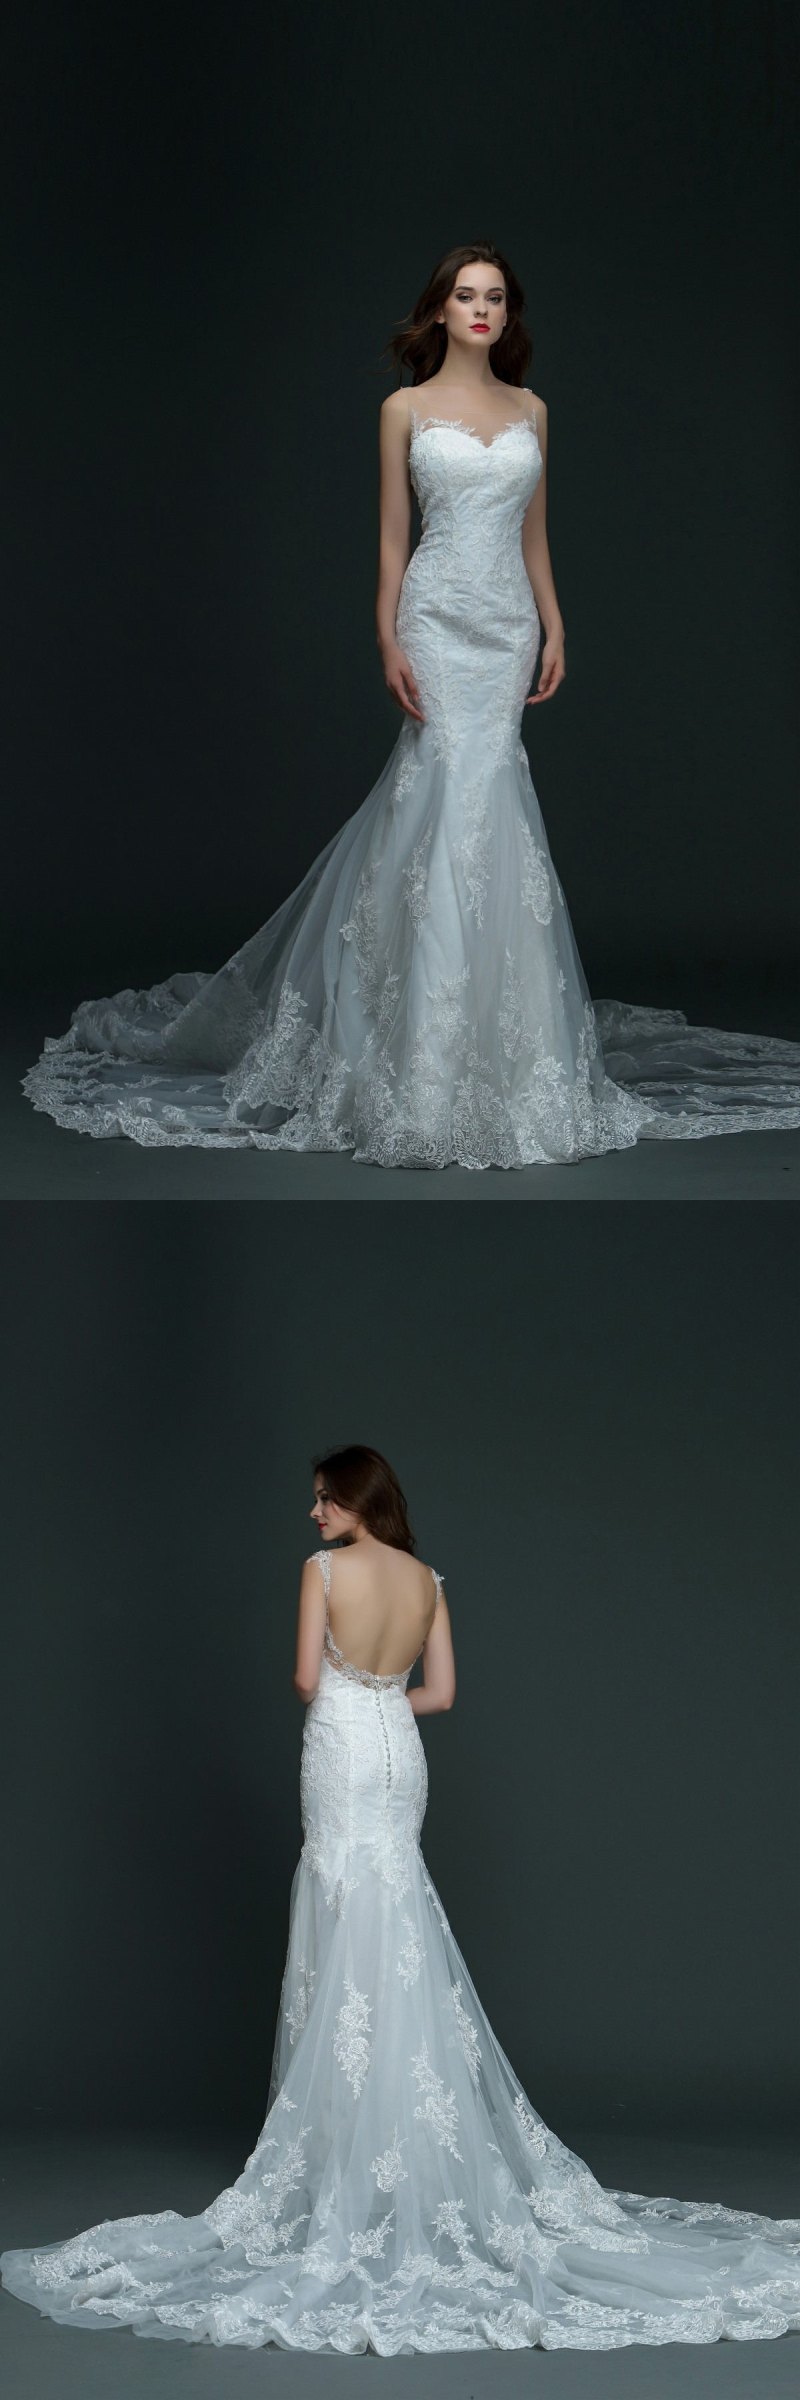 Wedding dresses stores  Gina A glamorous wedding dress needs expert craftsmanship and